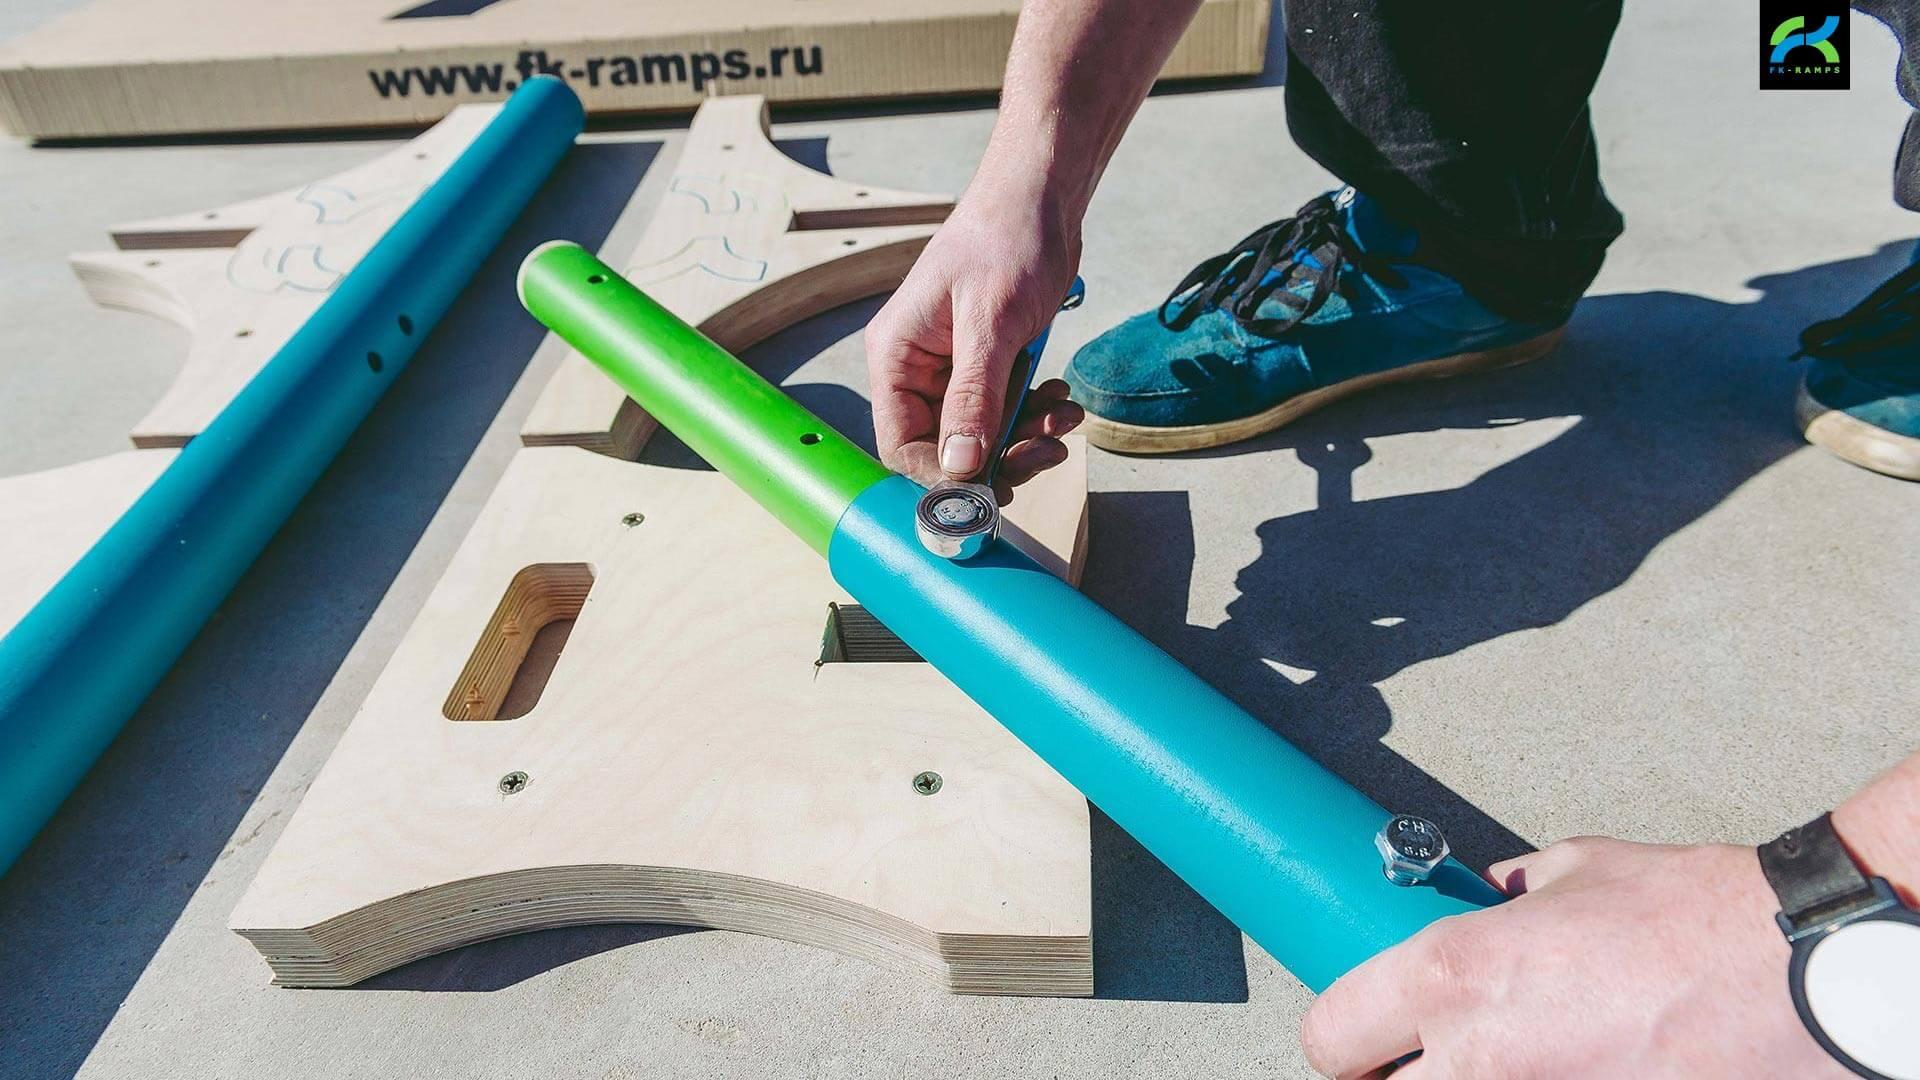 Набор для трюков на bmx - FK-ramps